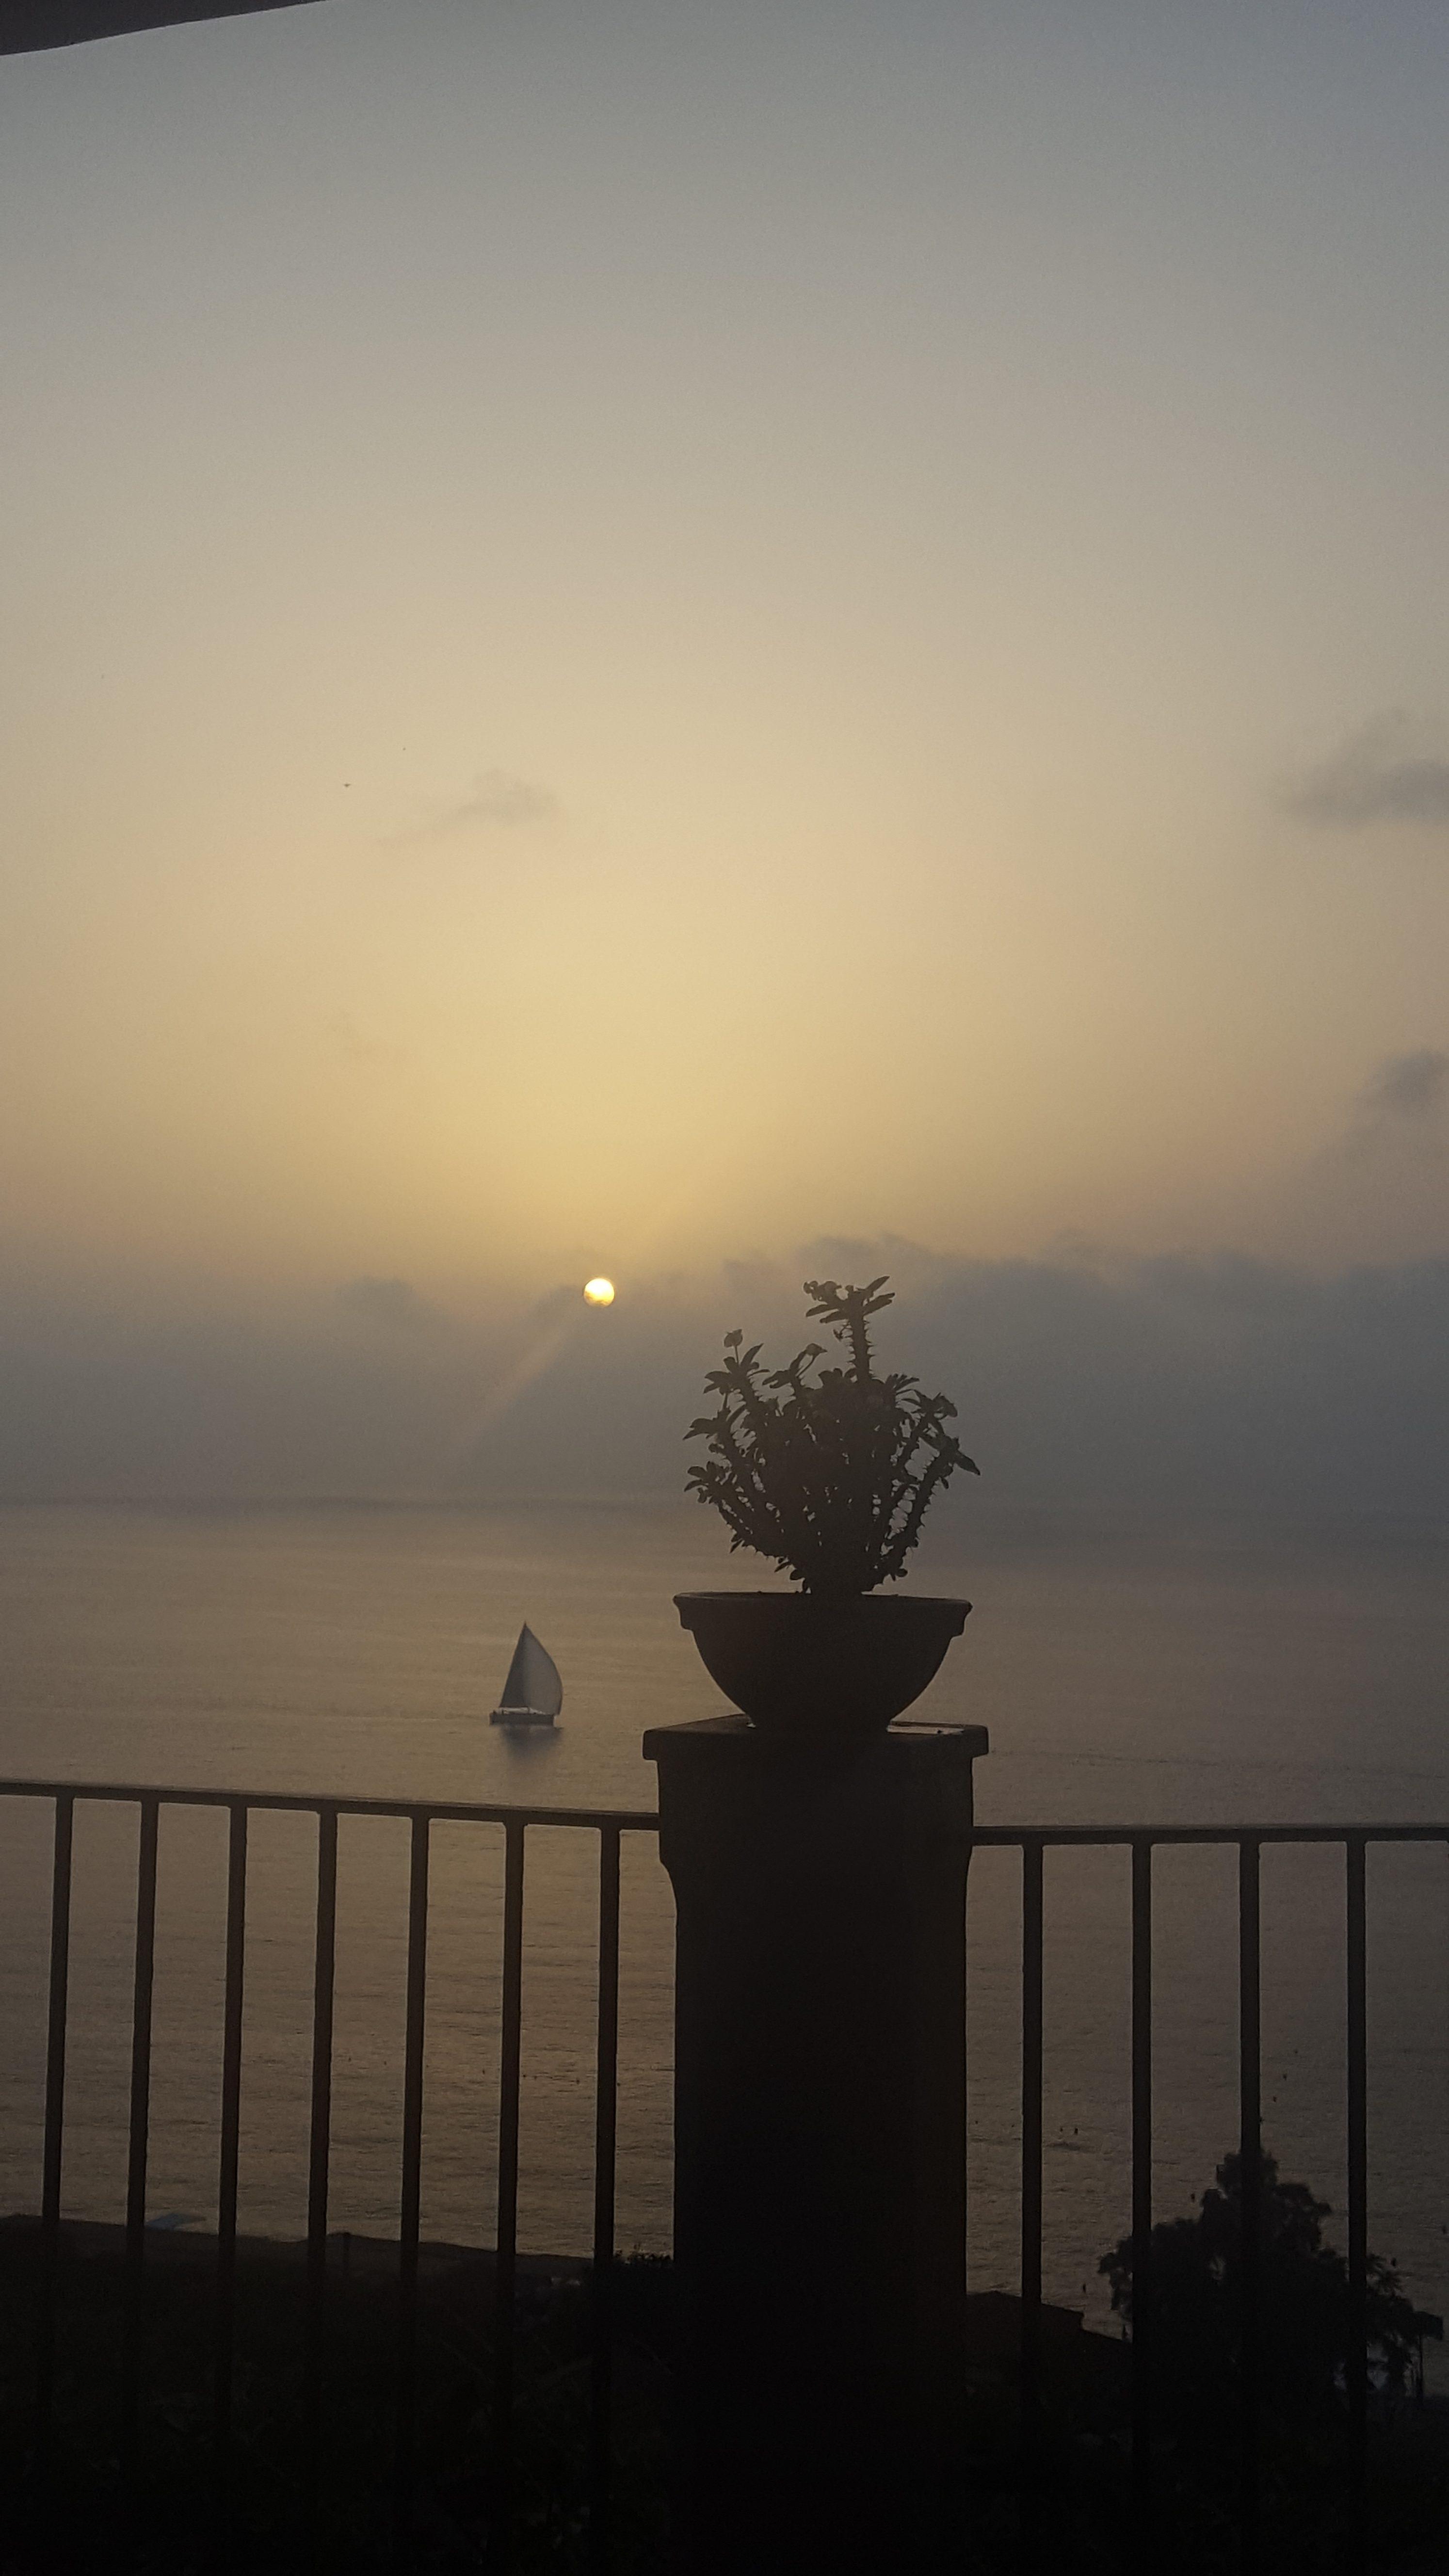 Sonnenuntergang Tropea - Kalabrien - Bella amore mio - Italien-Blog